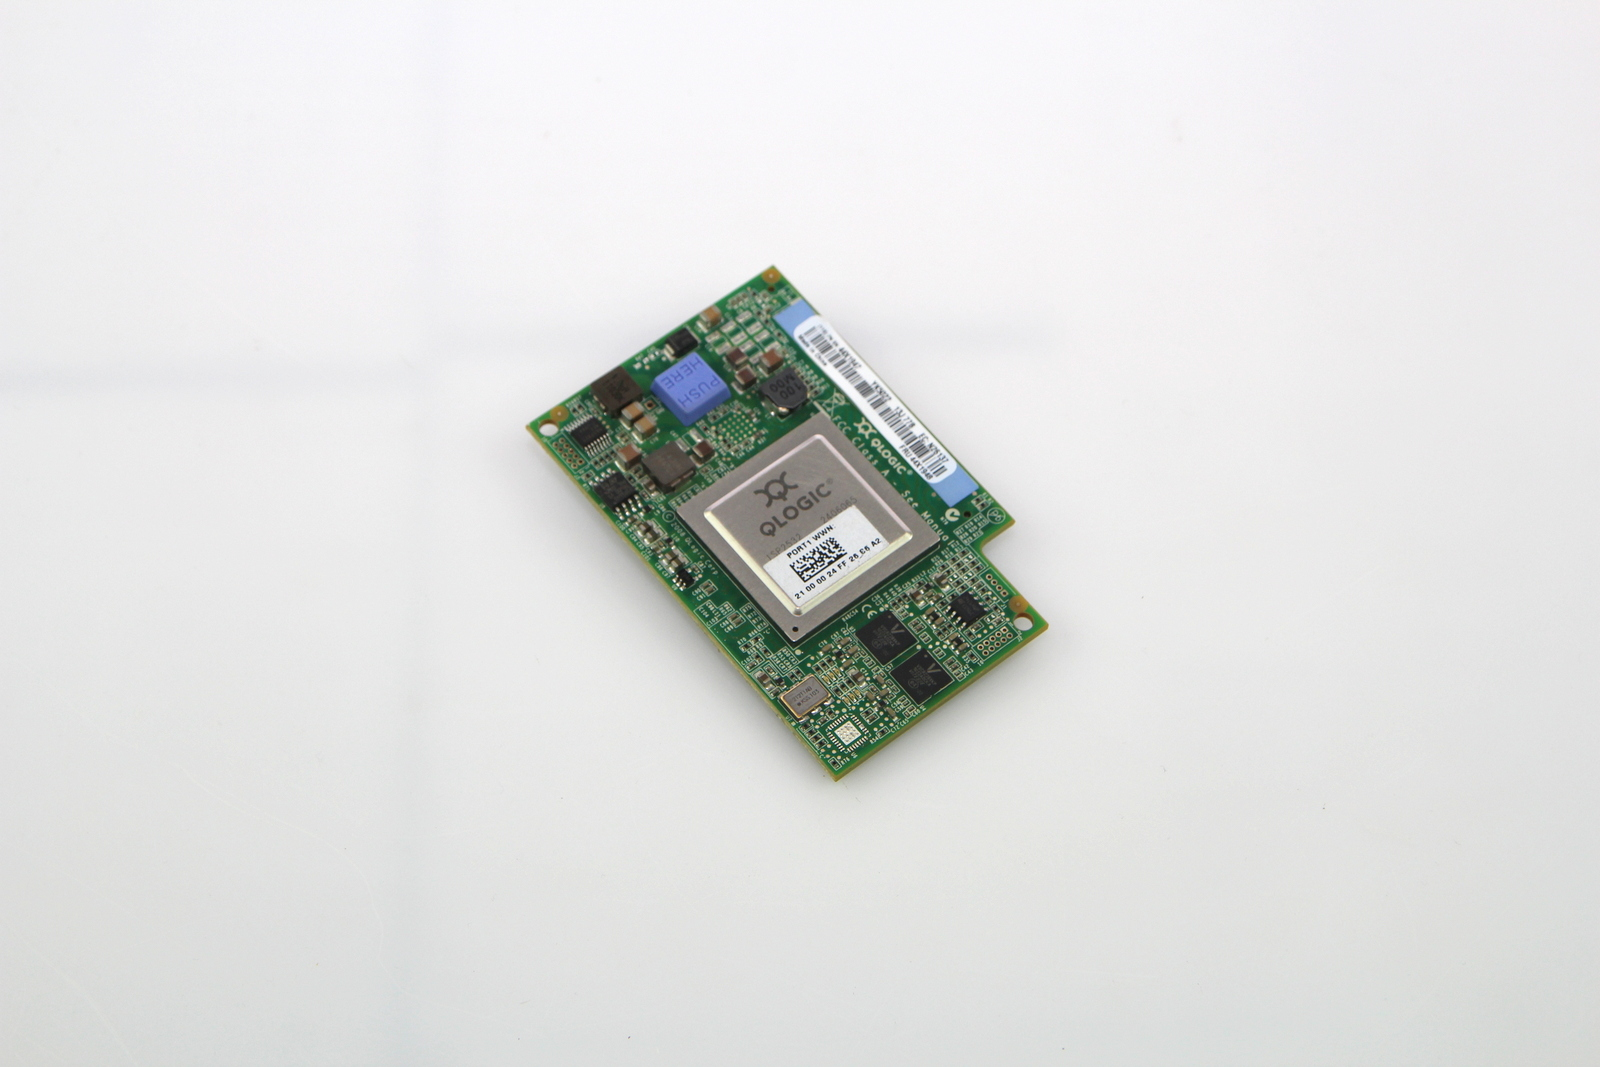 IBM QLOGIC 8GB FC 44X1948 QMI2582 FIBRE CHANNEL EXPANSION CARD 44X1945 44X1947